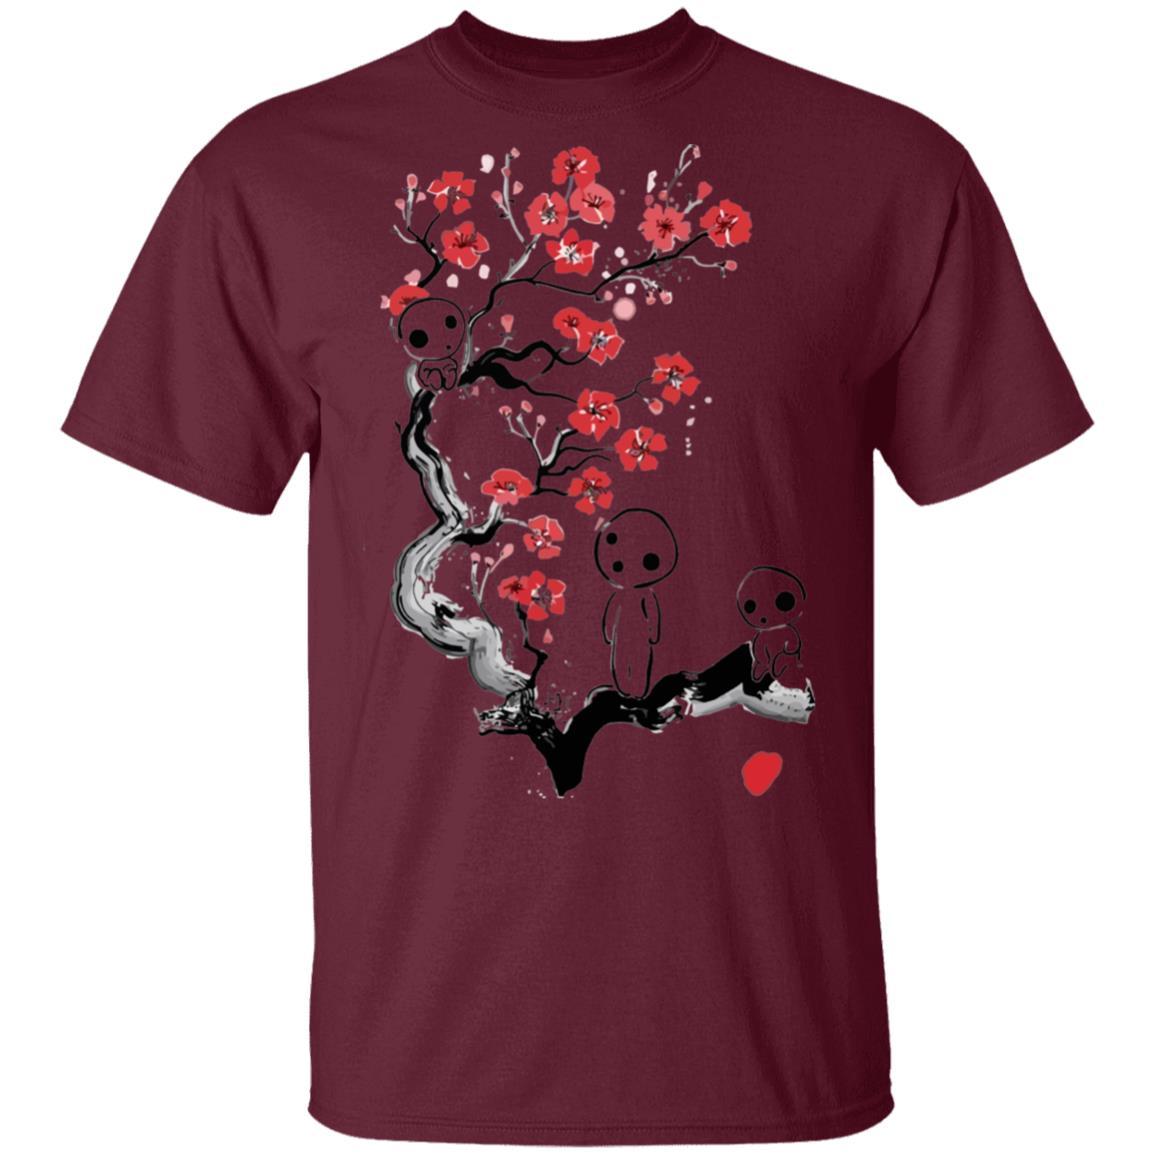 Princess Mononoke – Tree Spirits on the Cherry Blossom T Shirt Unisex